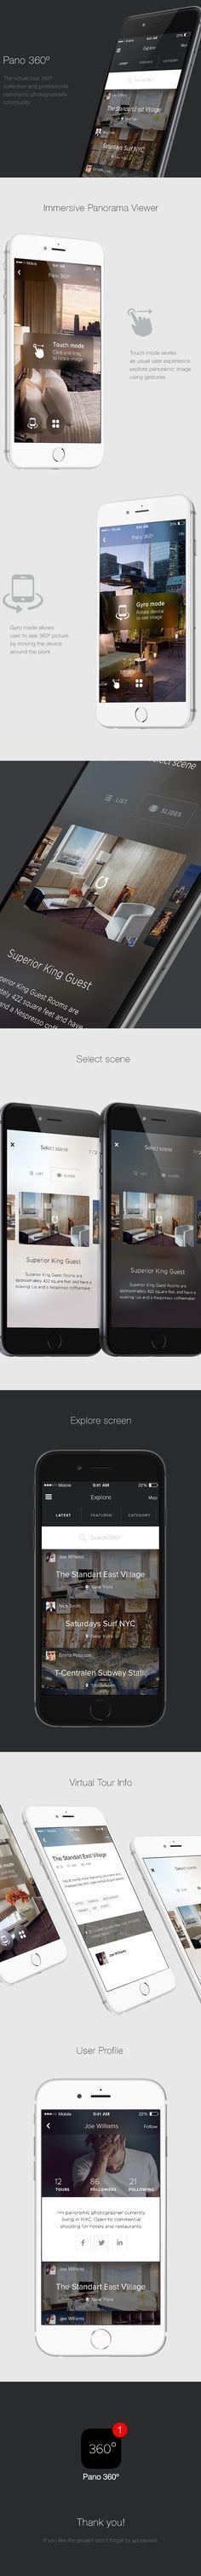 Pano 360º - UX/UI iPhone app design on Behance